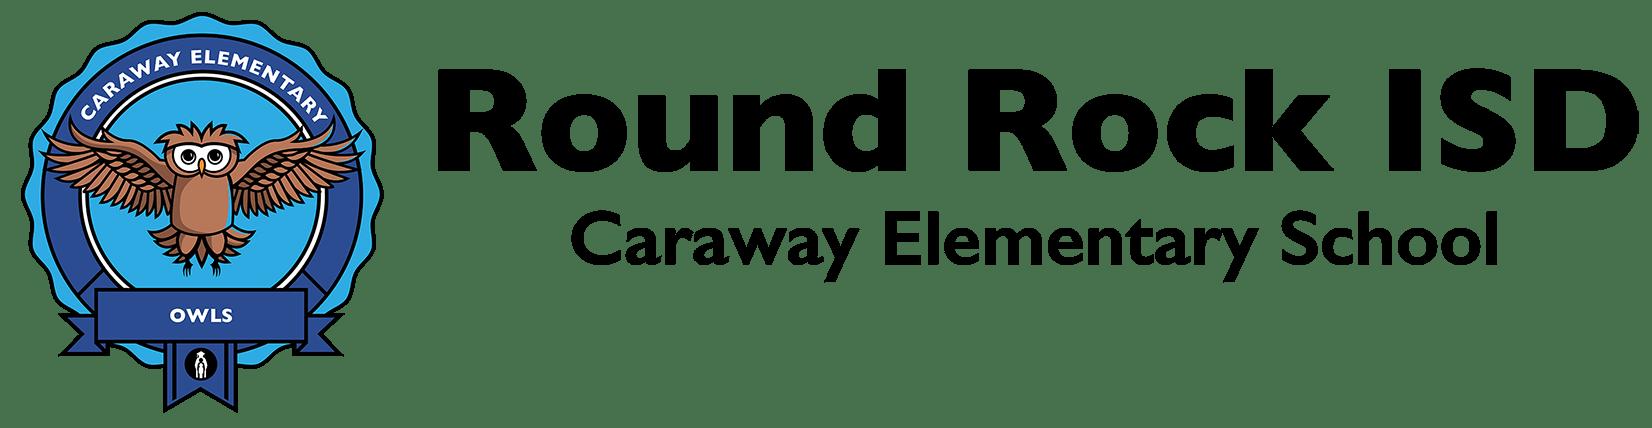 Caraway Elementary School